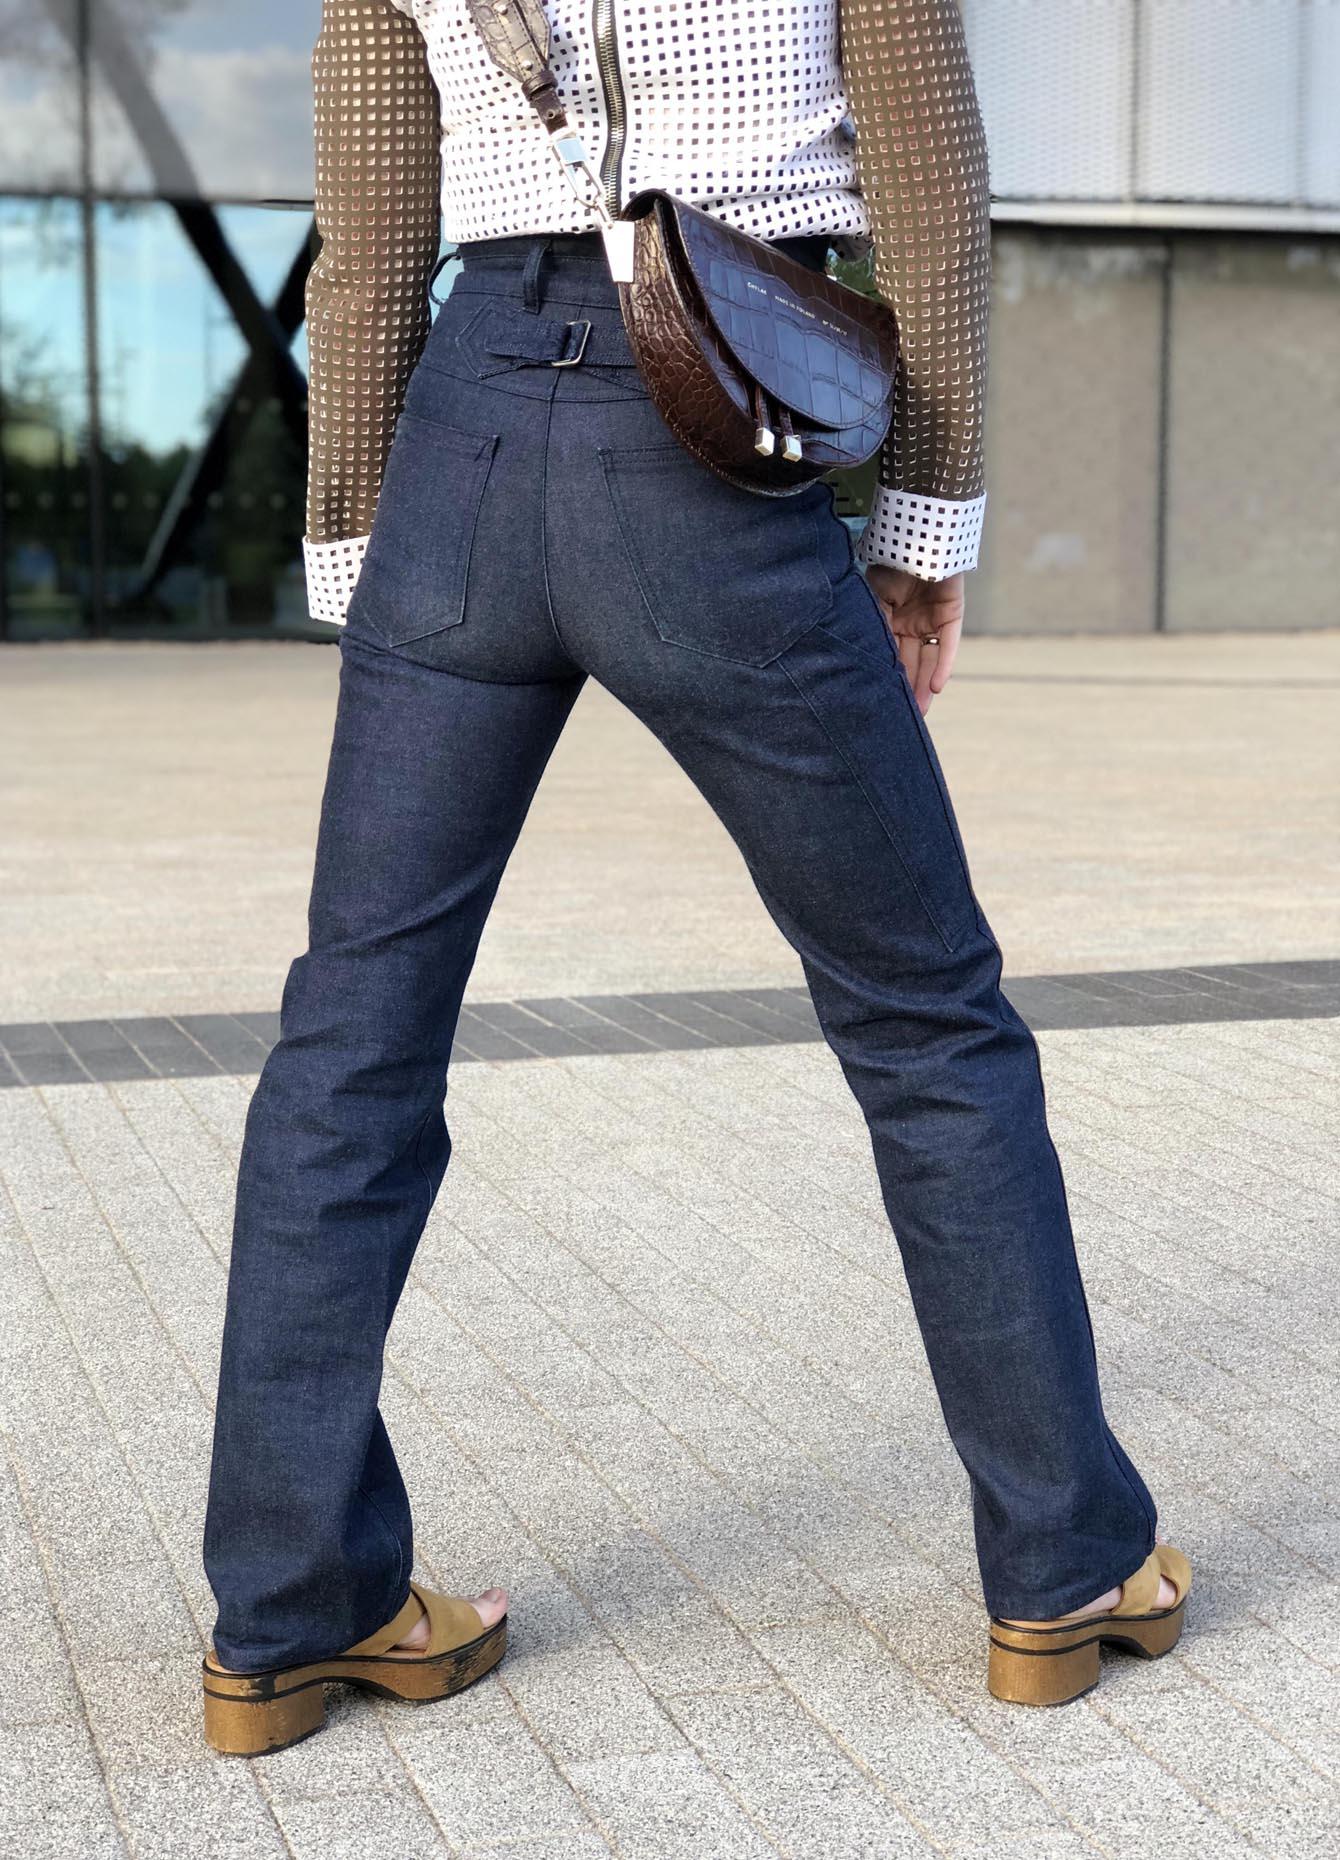 acne jeans zofia chylak saddle bag vagabond shoes by fashion art media